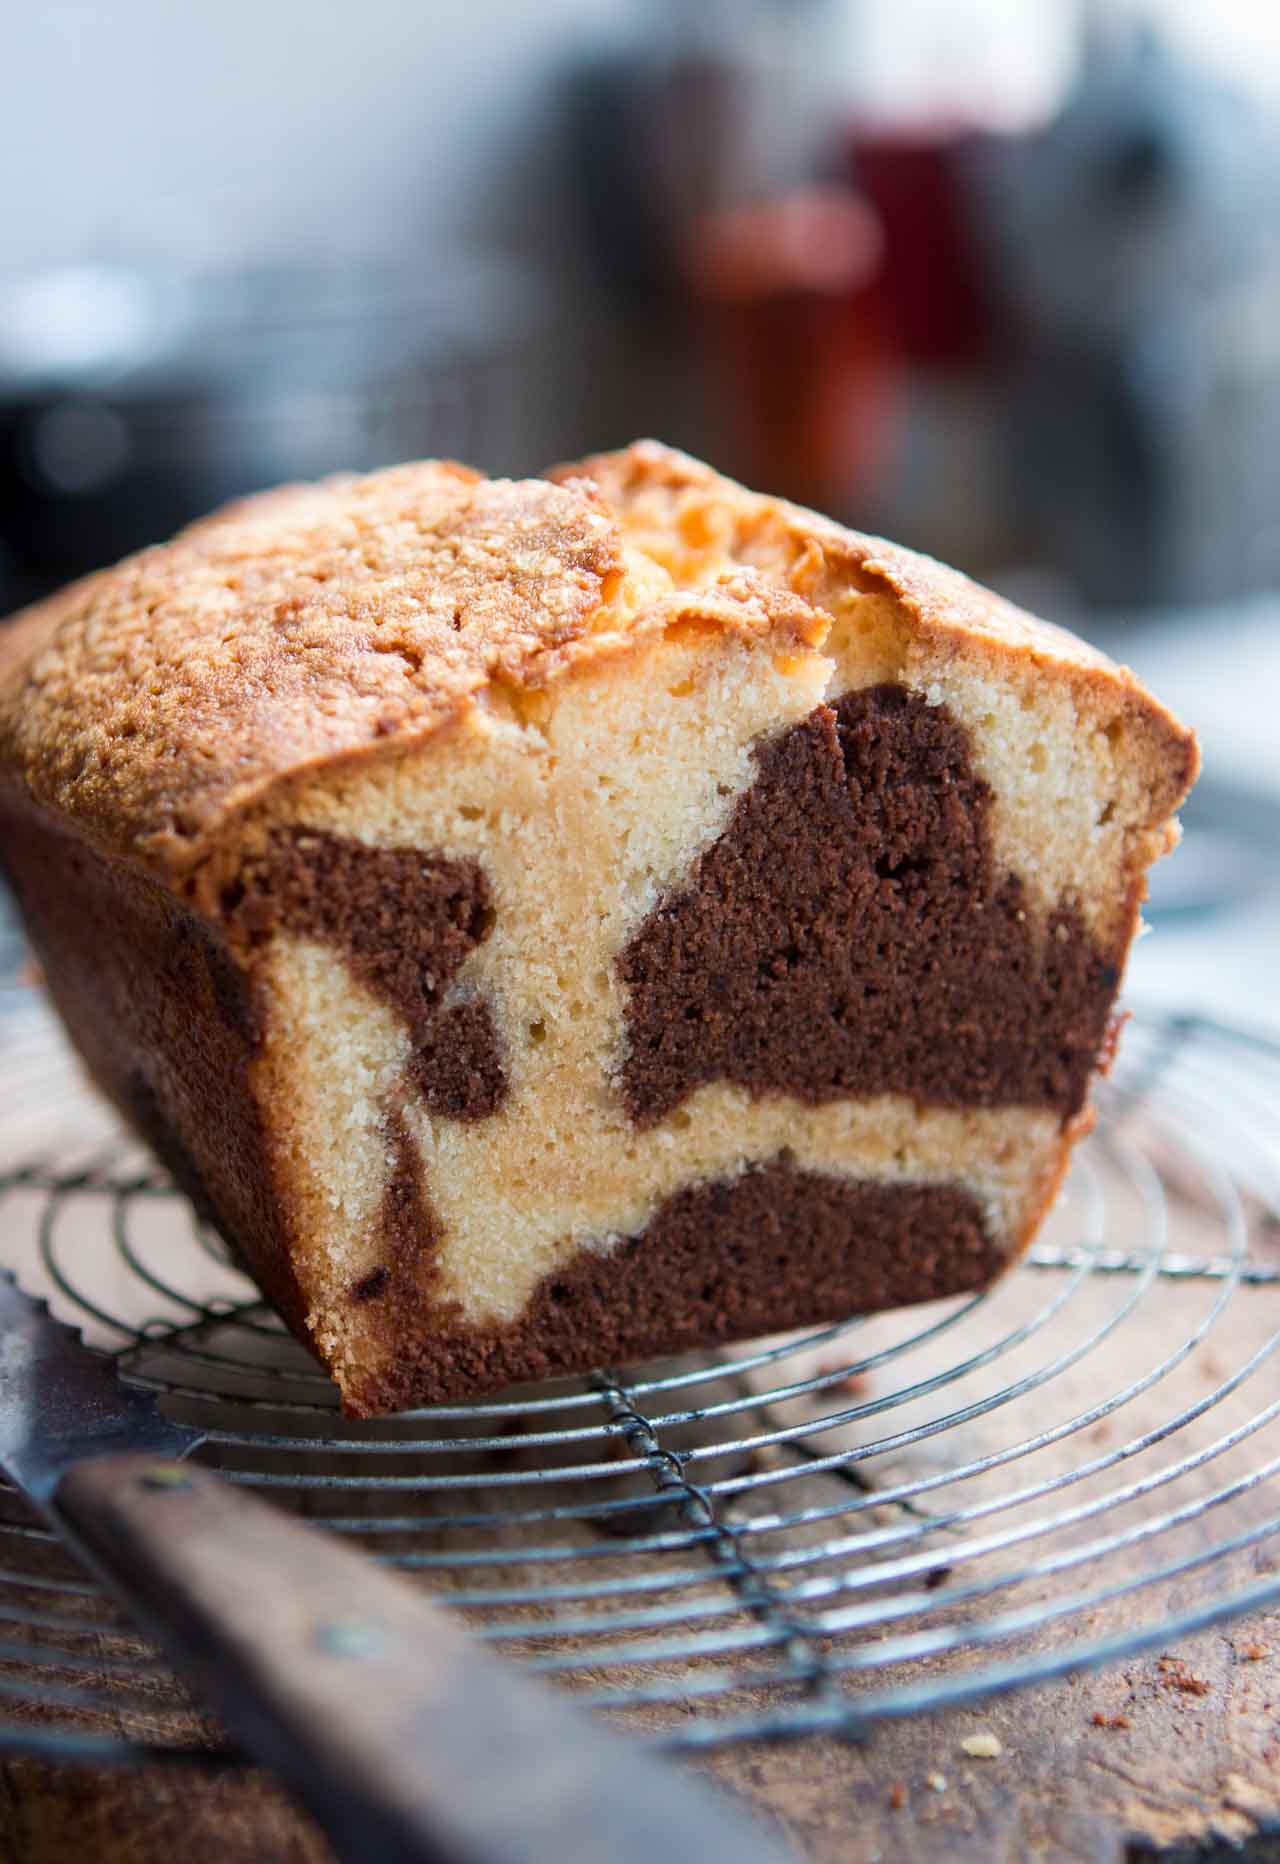 Chocolate, Dulce de Leche, and Vanilla Marble Cake